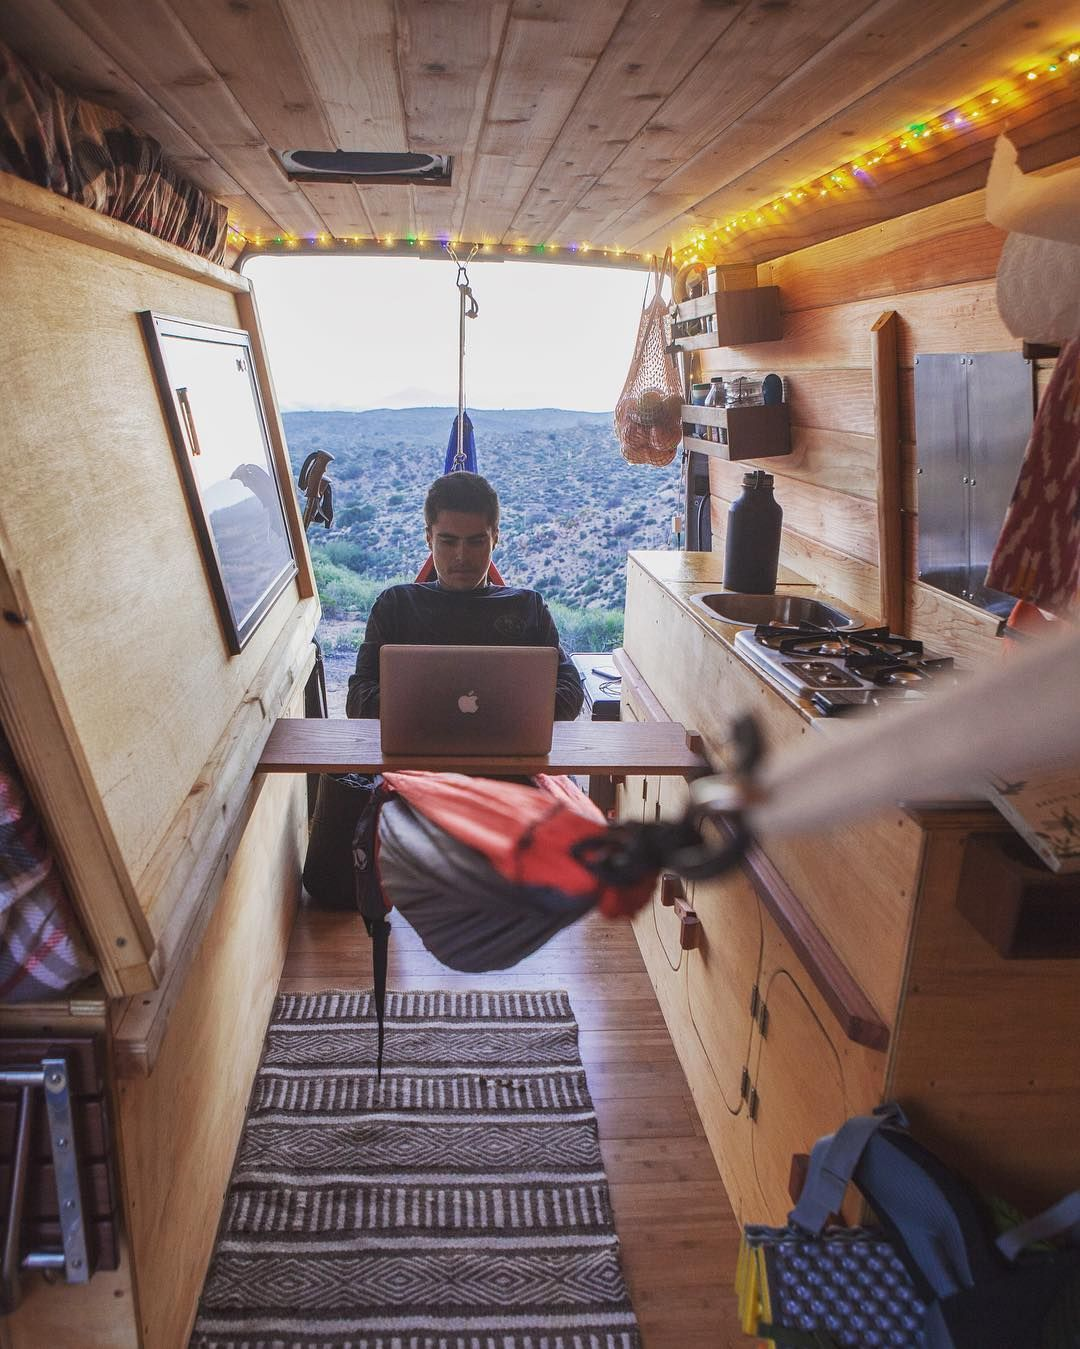 vanlife die 10 sch nsten diy camper auf instagram adventure van 39 s wohnmobil wohnwagen. Black Bedroom Furniture Sets. Home Design Ideas